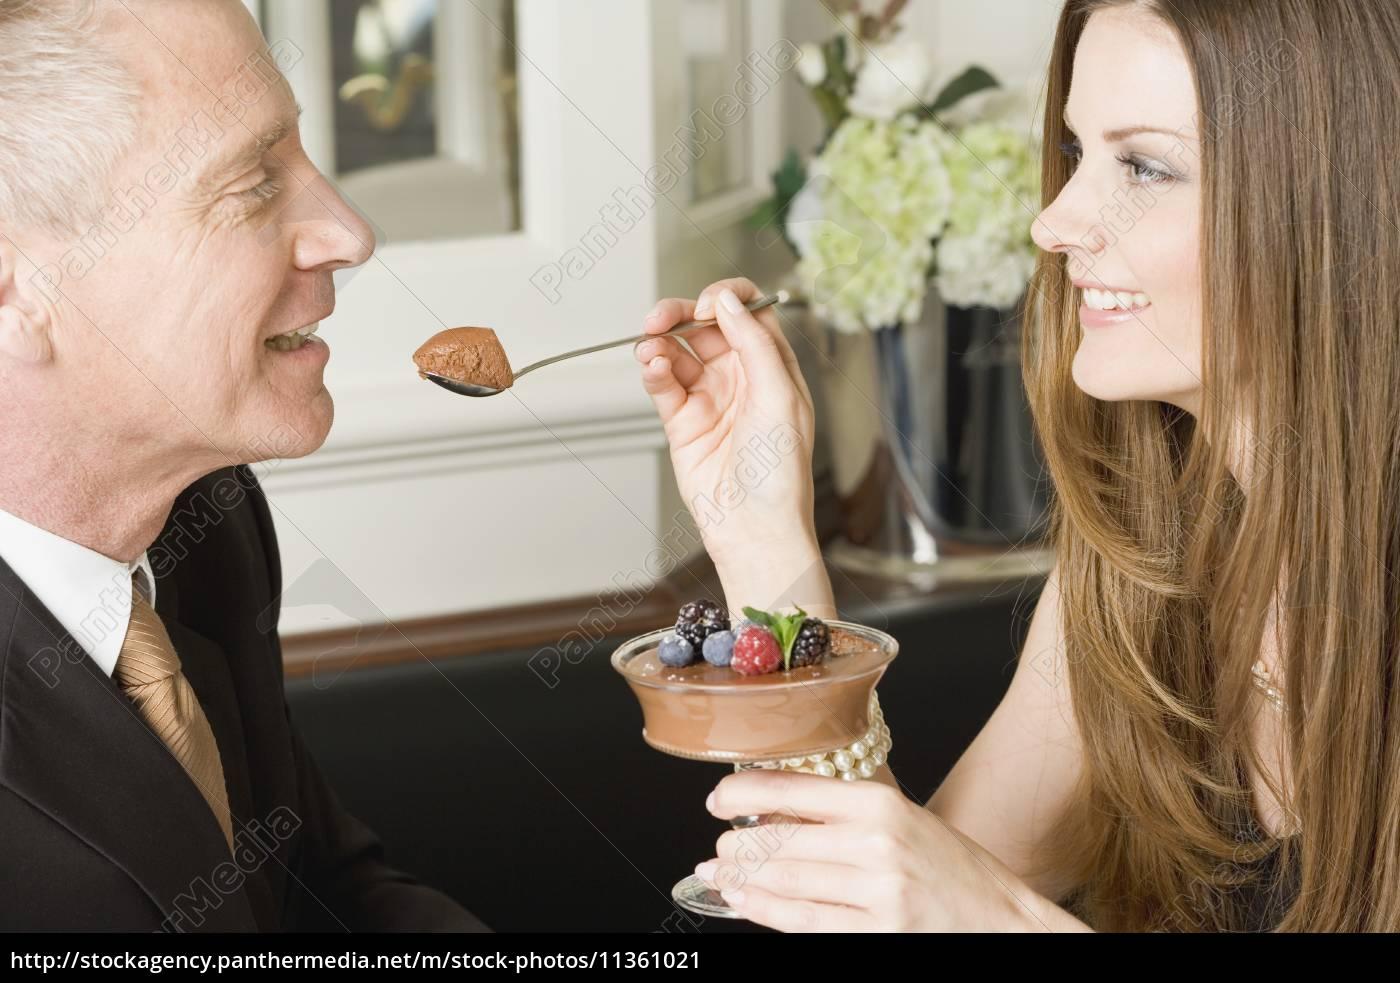 frau, restaurant, profil, menschen, leute, personen - 11361021